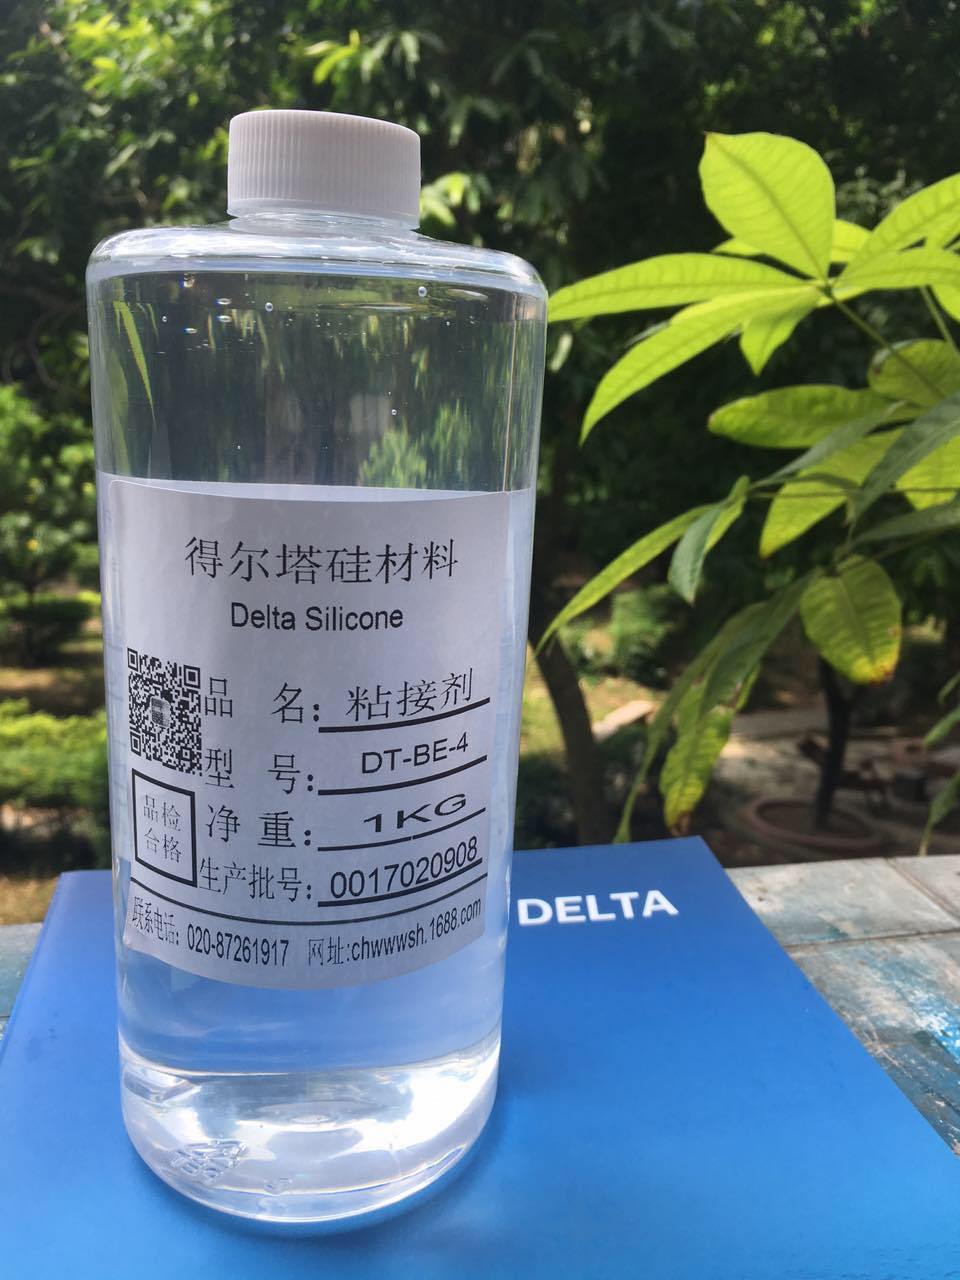 DT-BE-4 粘接剂 得尔塔 厂家直销优质粘接剂